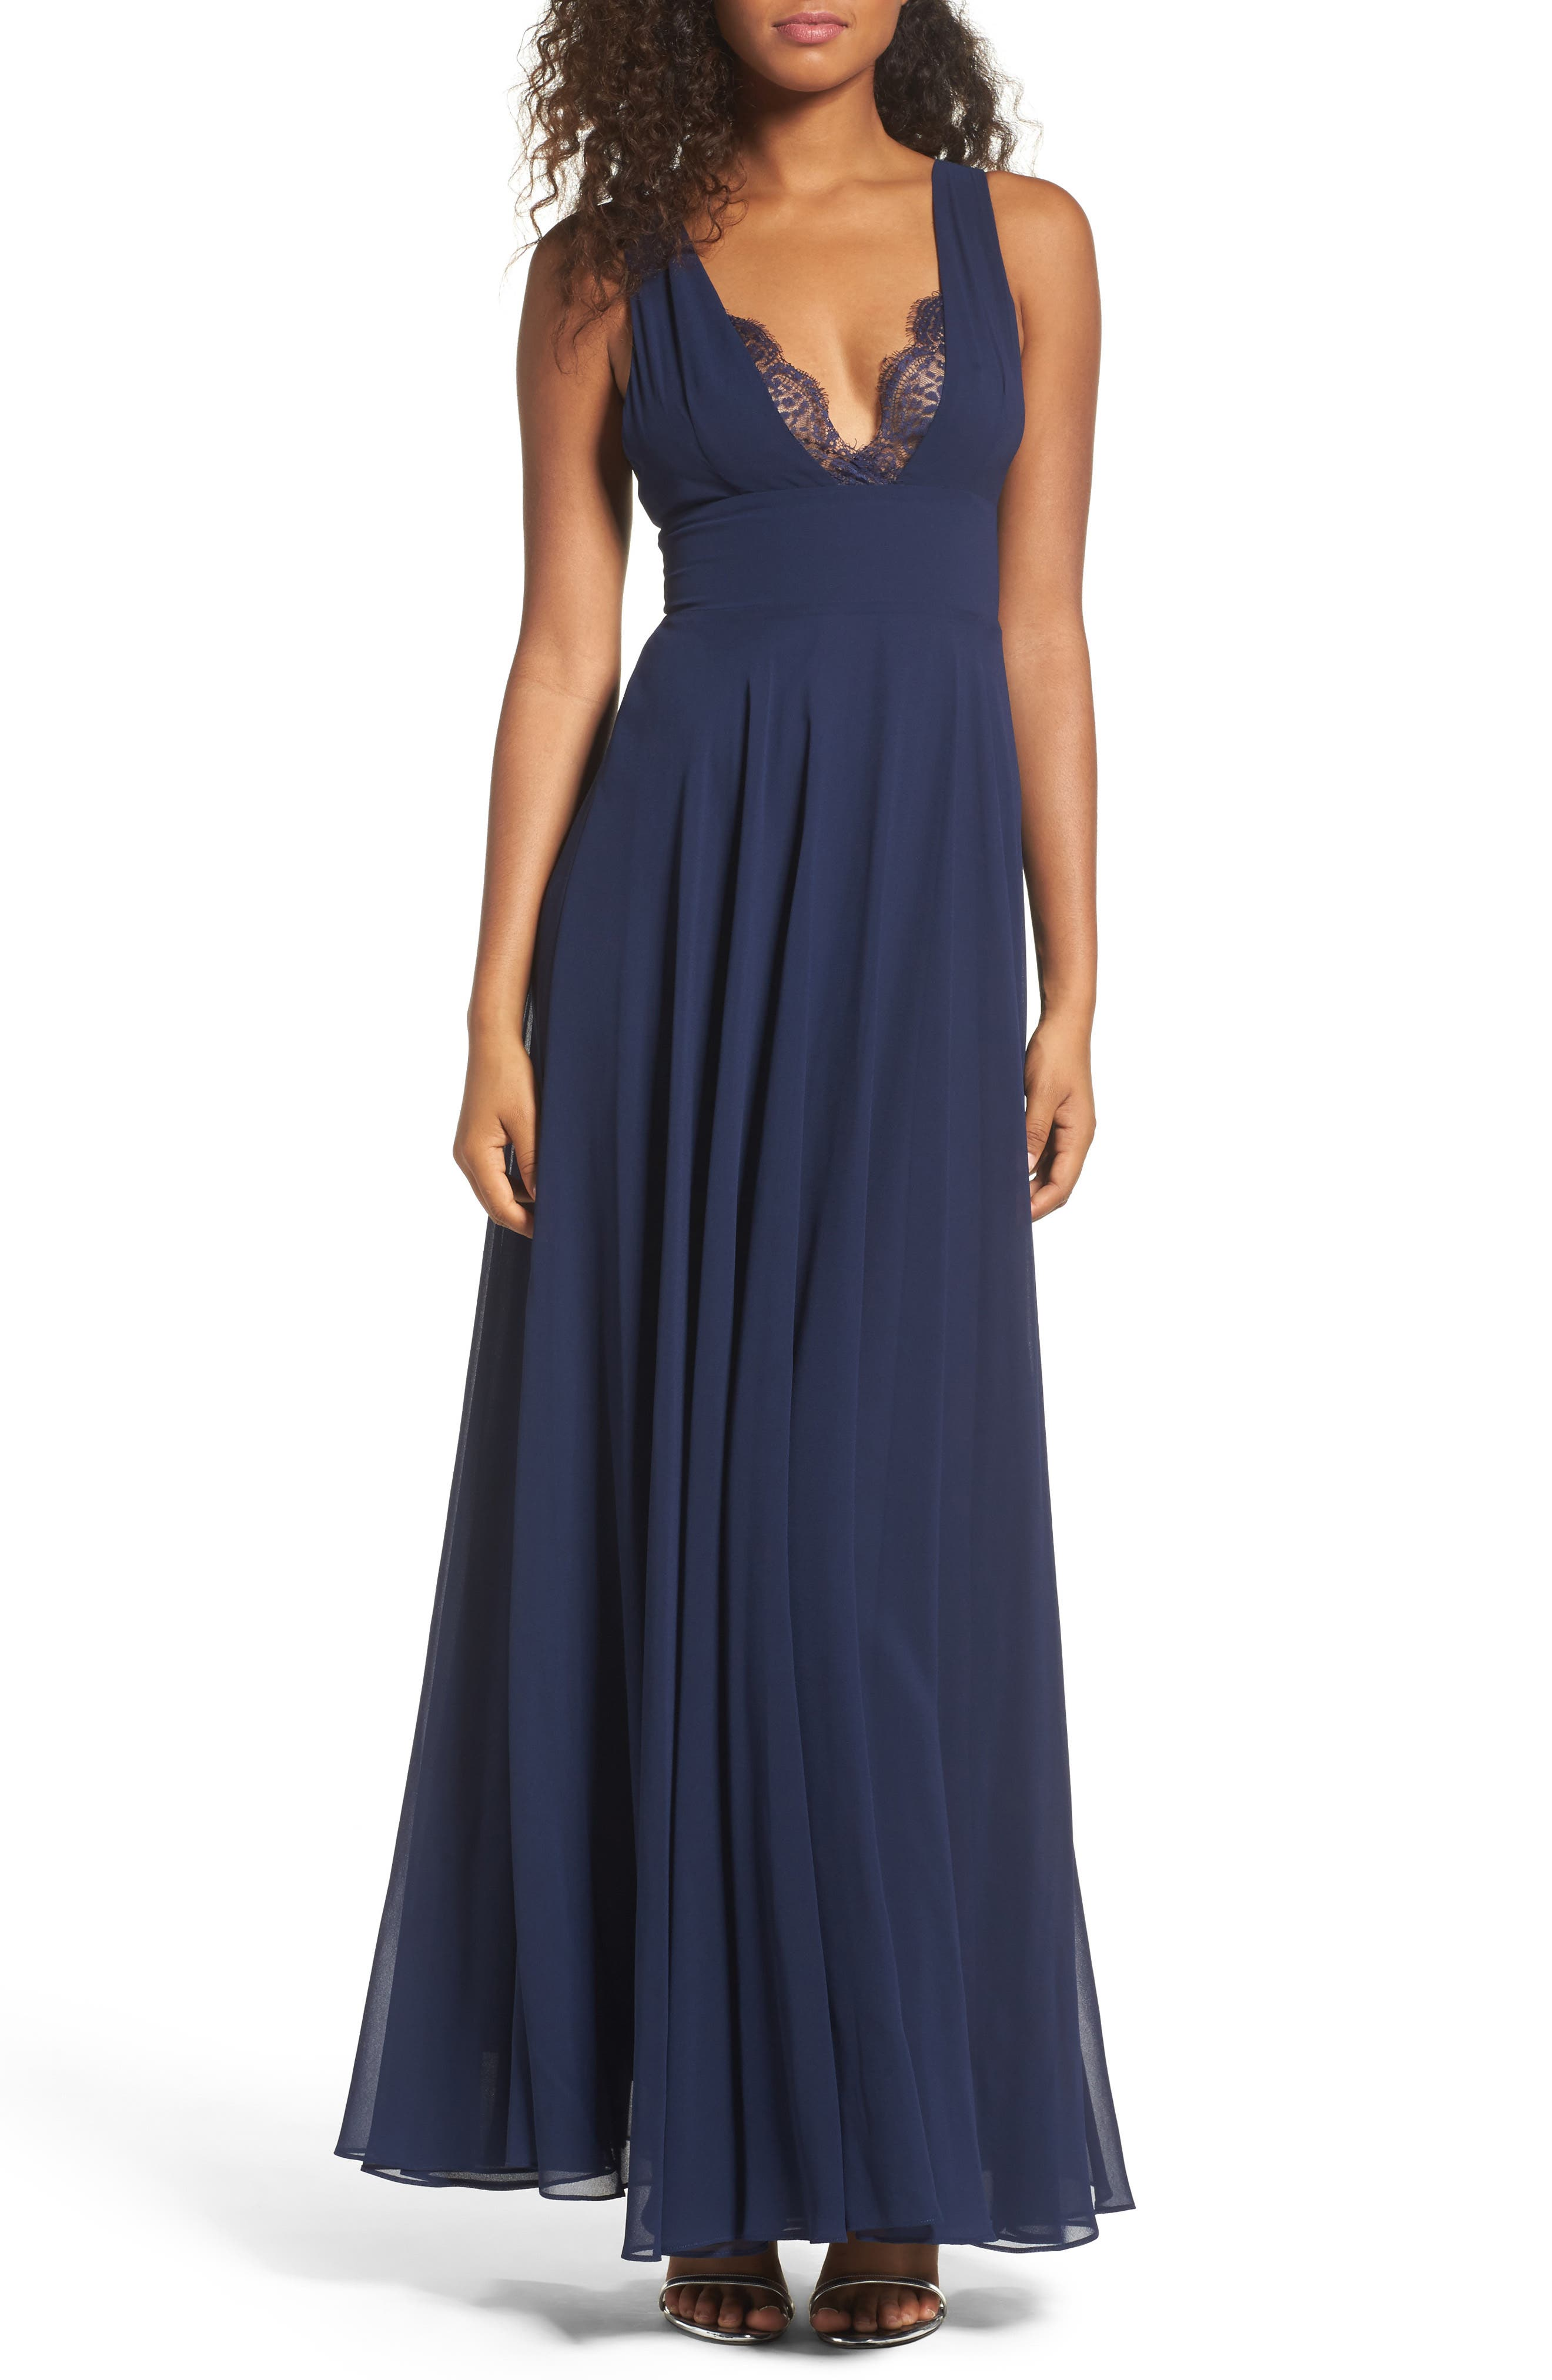 Alternate Image 1 Selected - Lulus Lace Trim Chiffon Maxi Dress